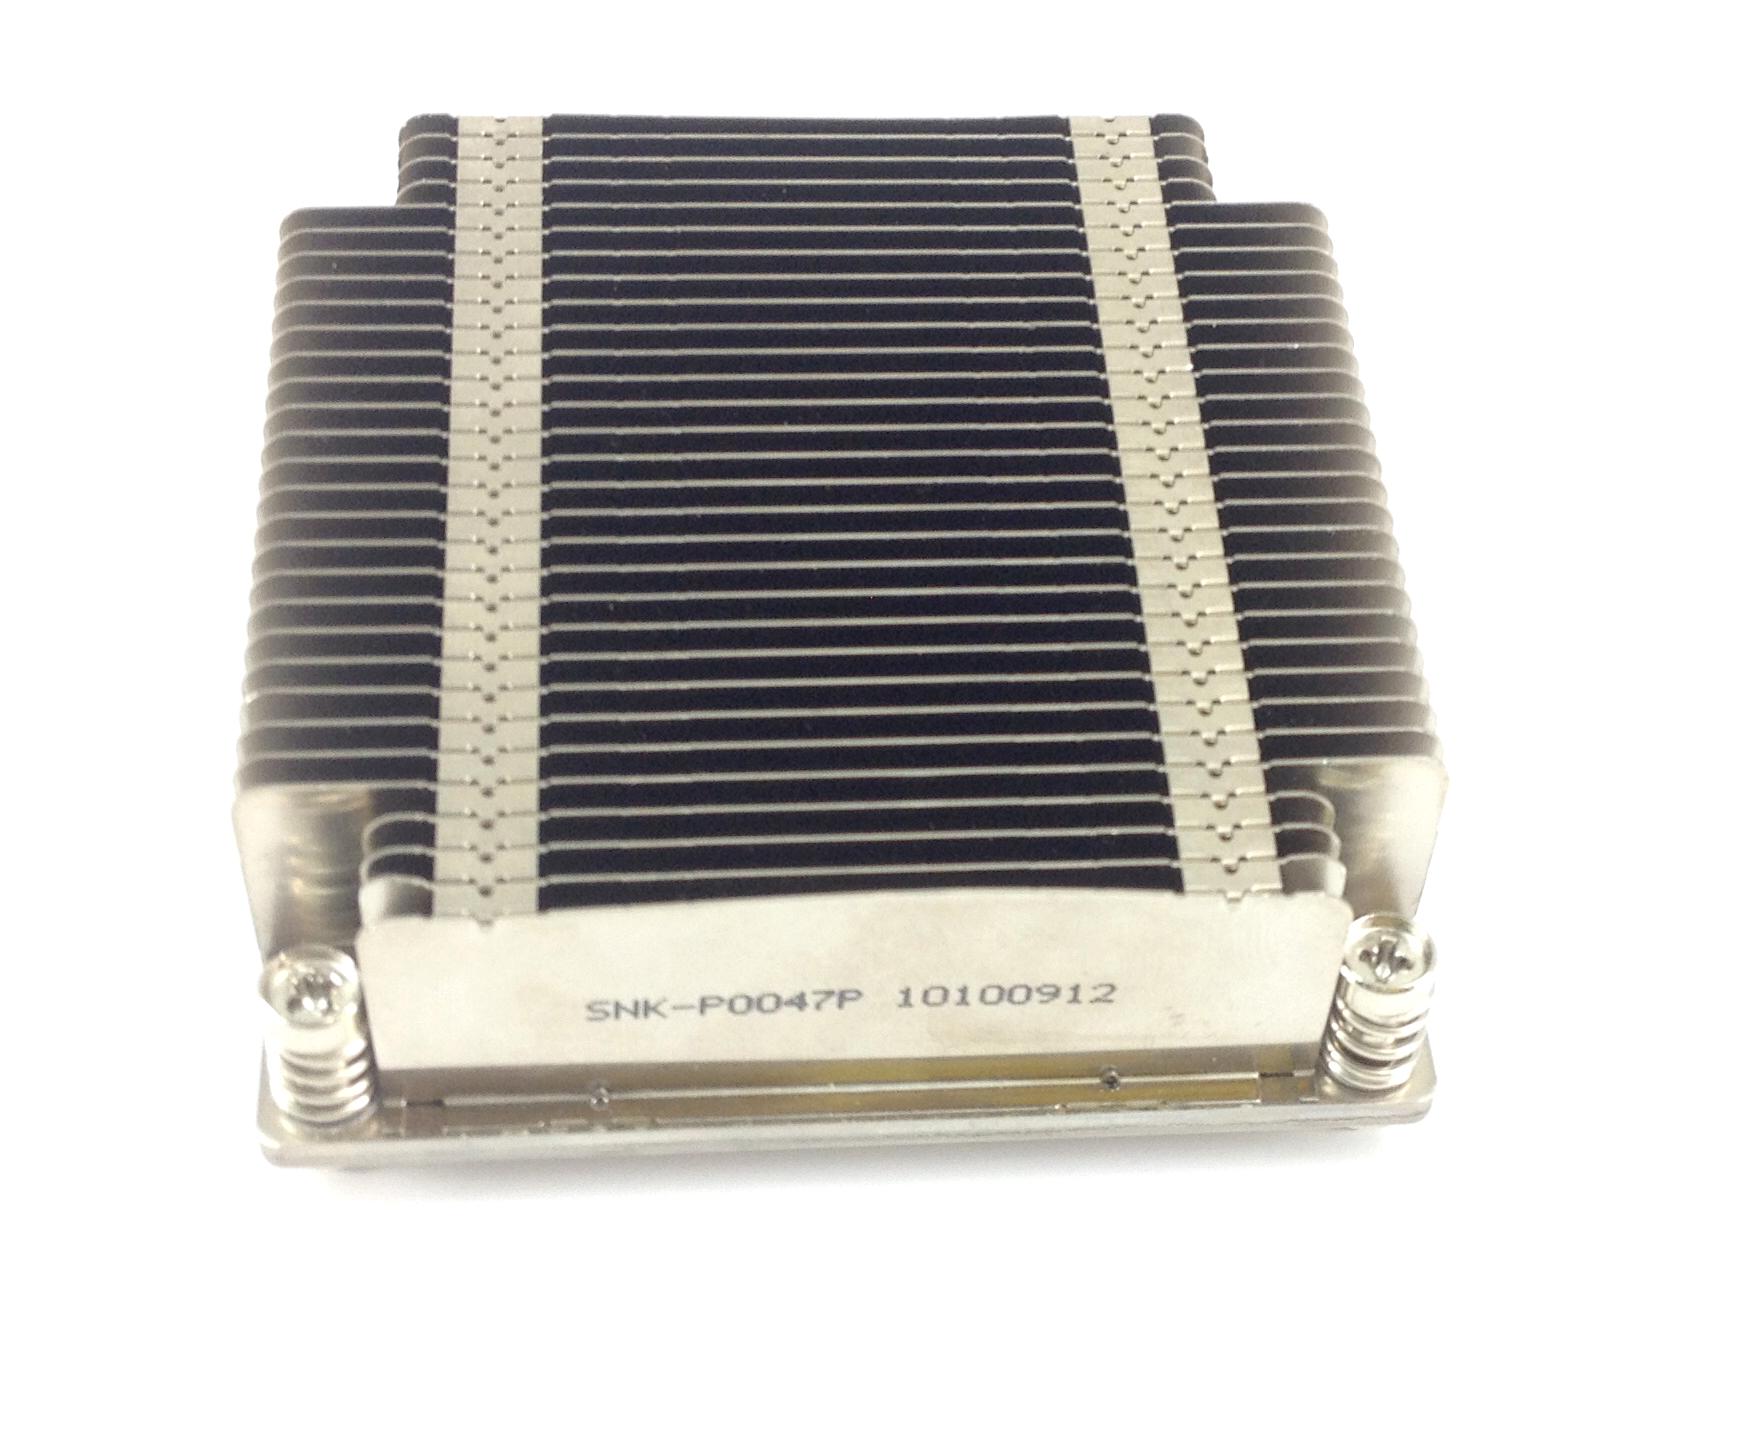 Supermicro 1U Passive CPU Heatsink LGA2011 for X9 UP/DP Systems (SNK-P0047P)